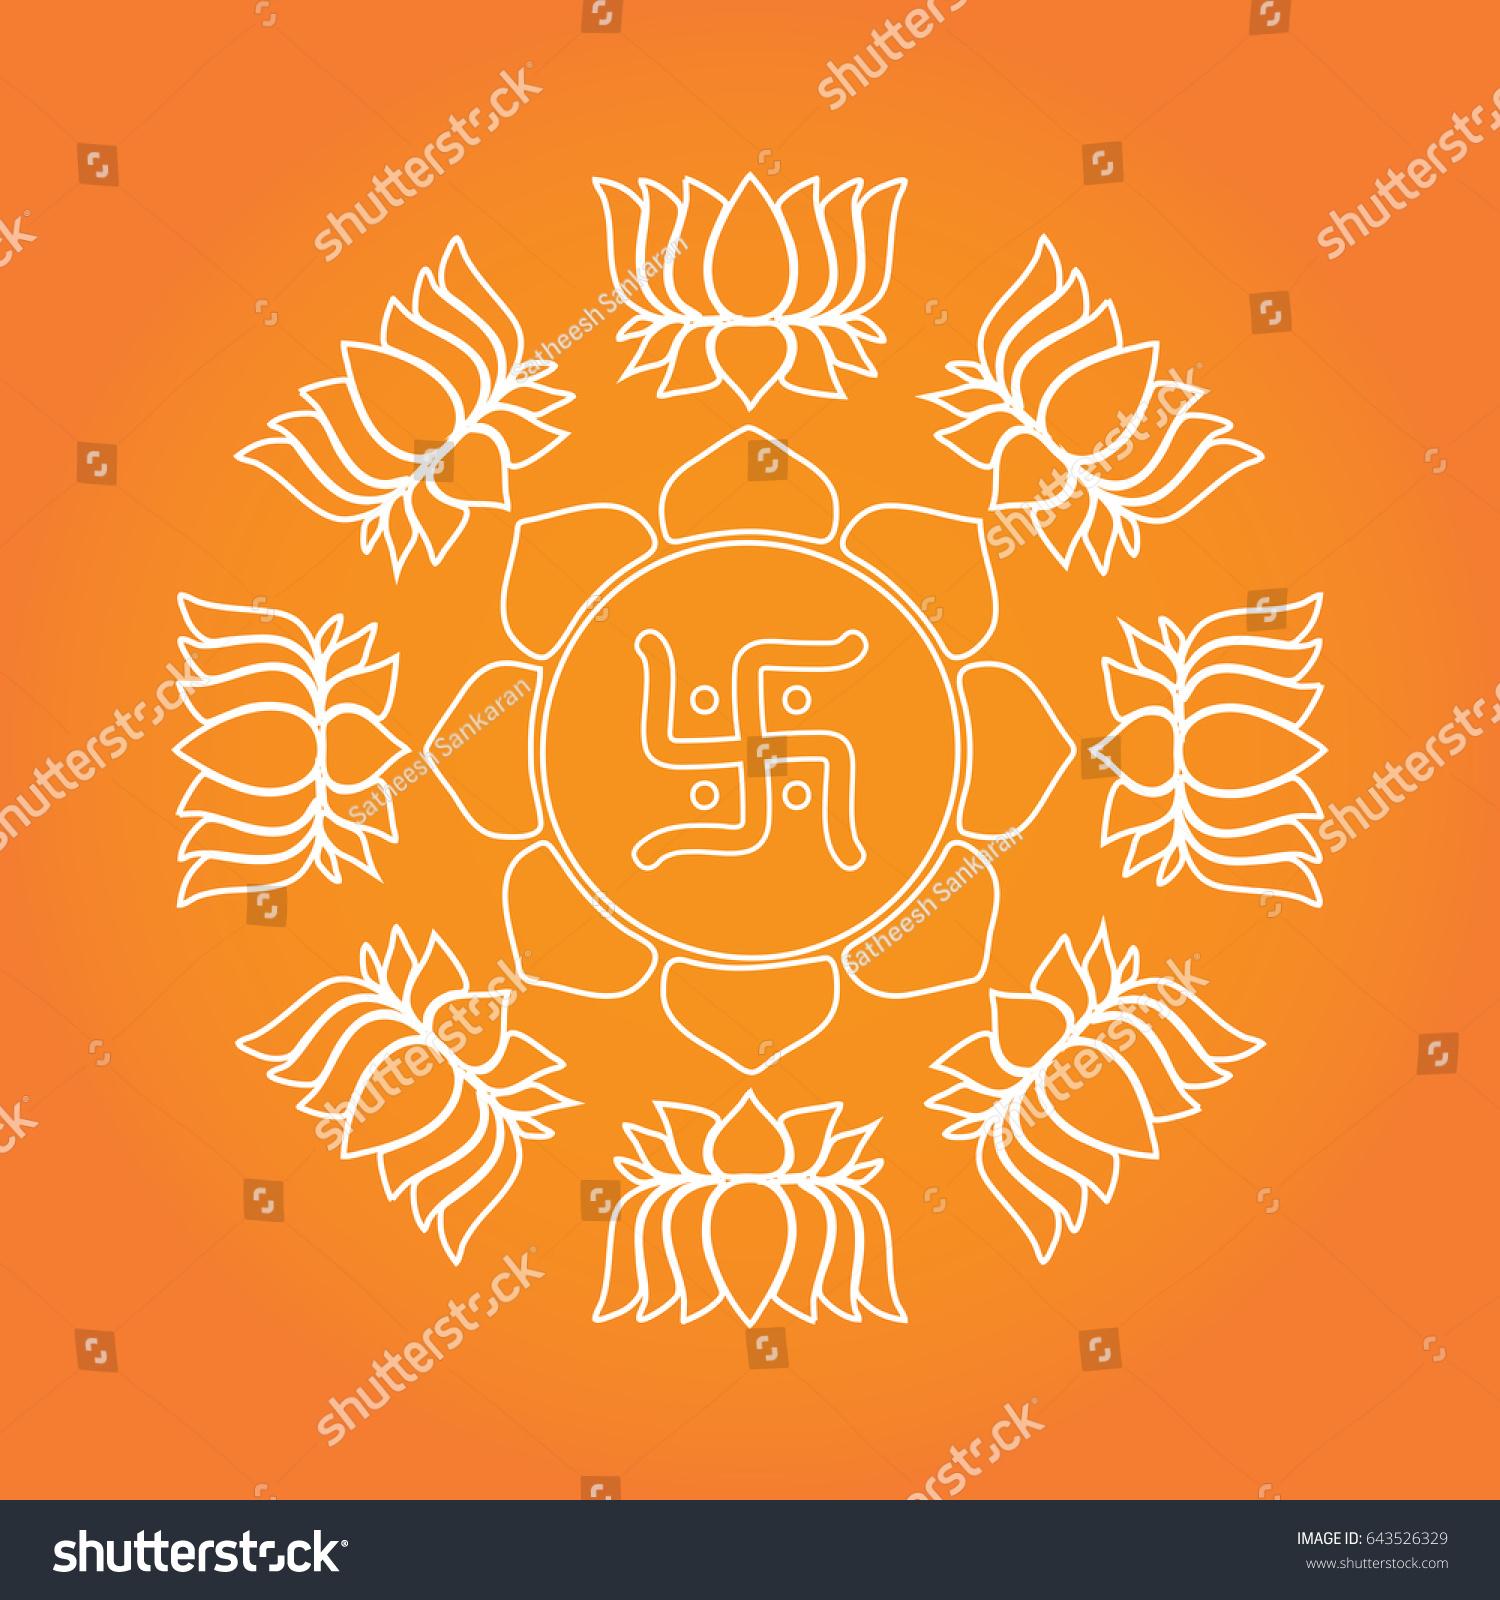 Swastika hindu religious symbol swastika vector stock vector swastika hindu religious symbol swastika vector illustration on lotus floral background pattern biocorpaavc